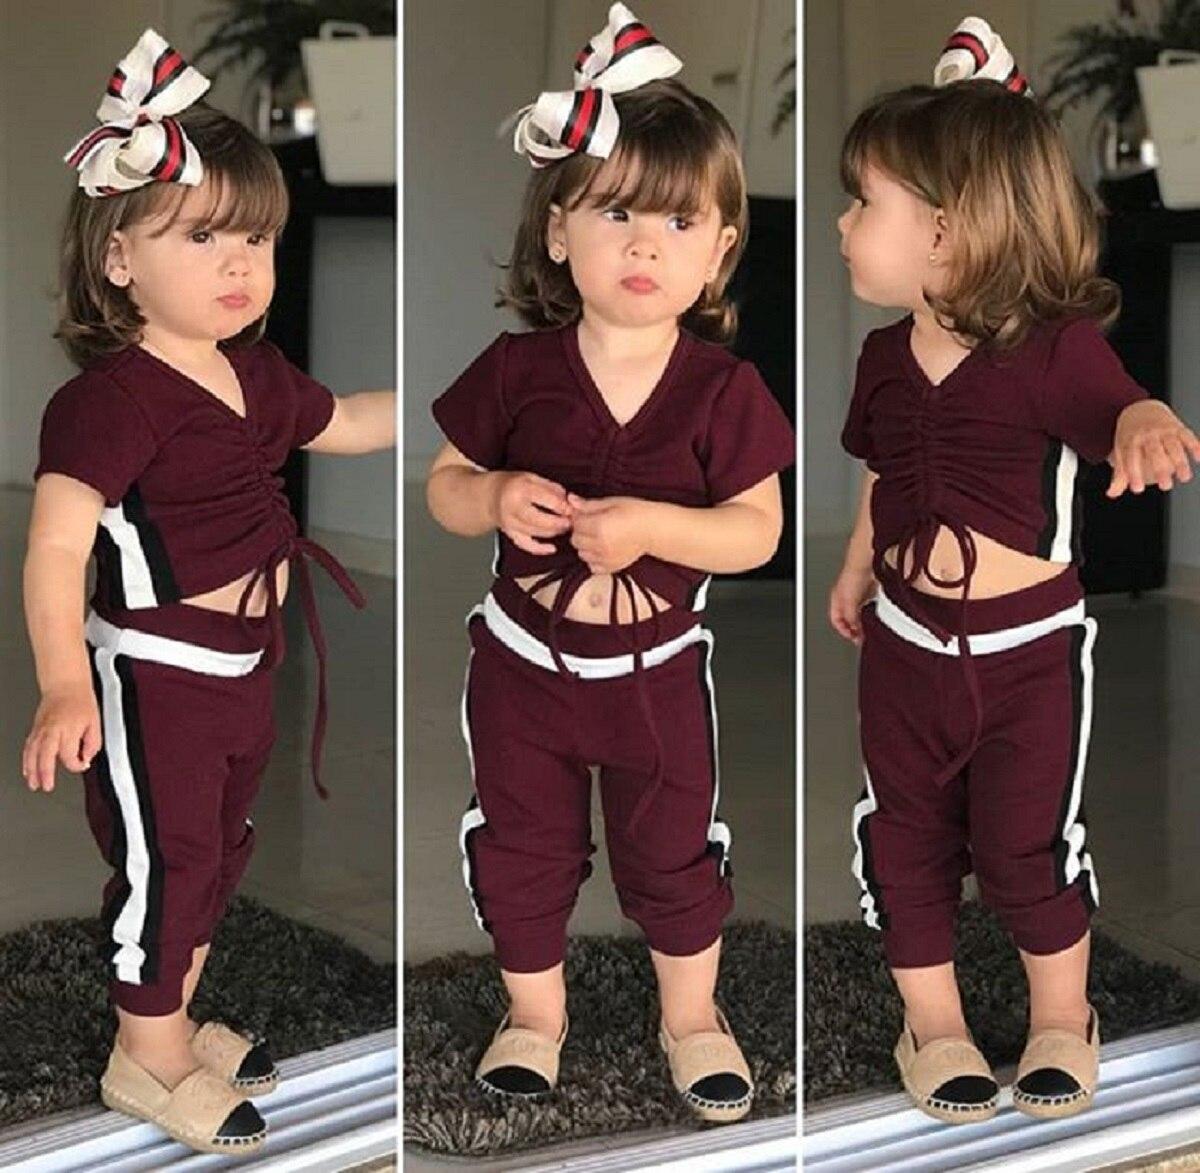 Toddler Kid Baby Girl Clothes Vest Crop Top+Floral Leggings Long 2PCS Outfit Set